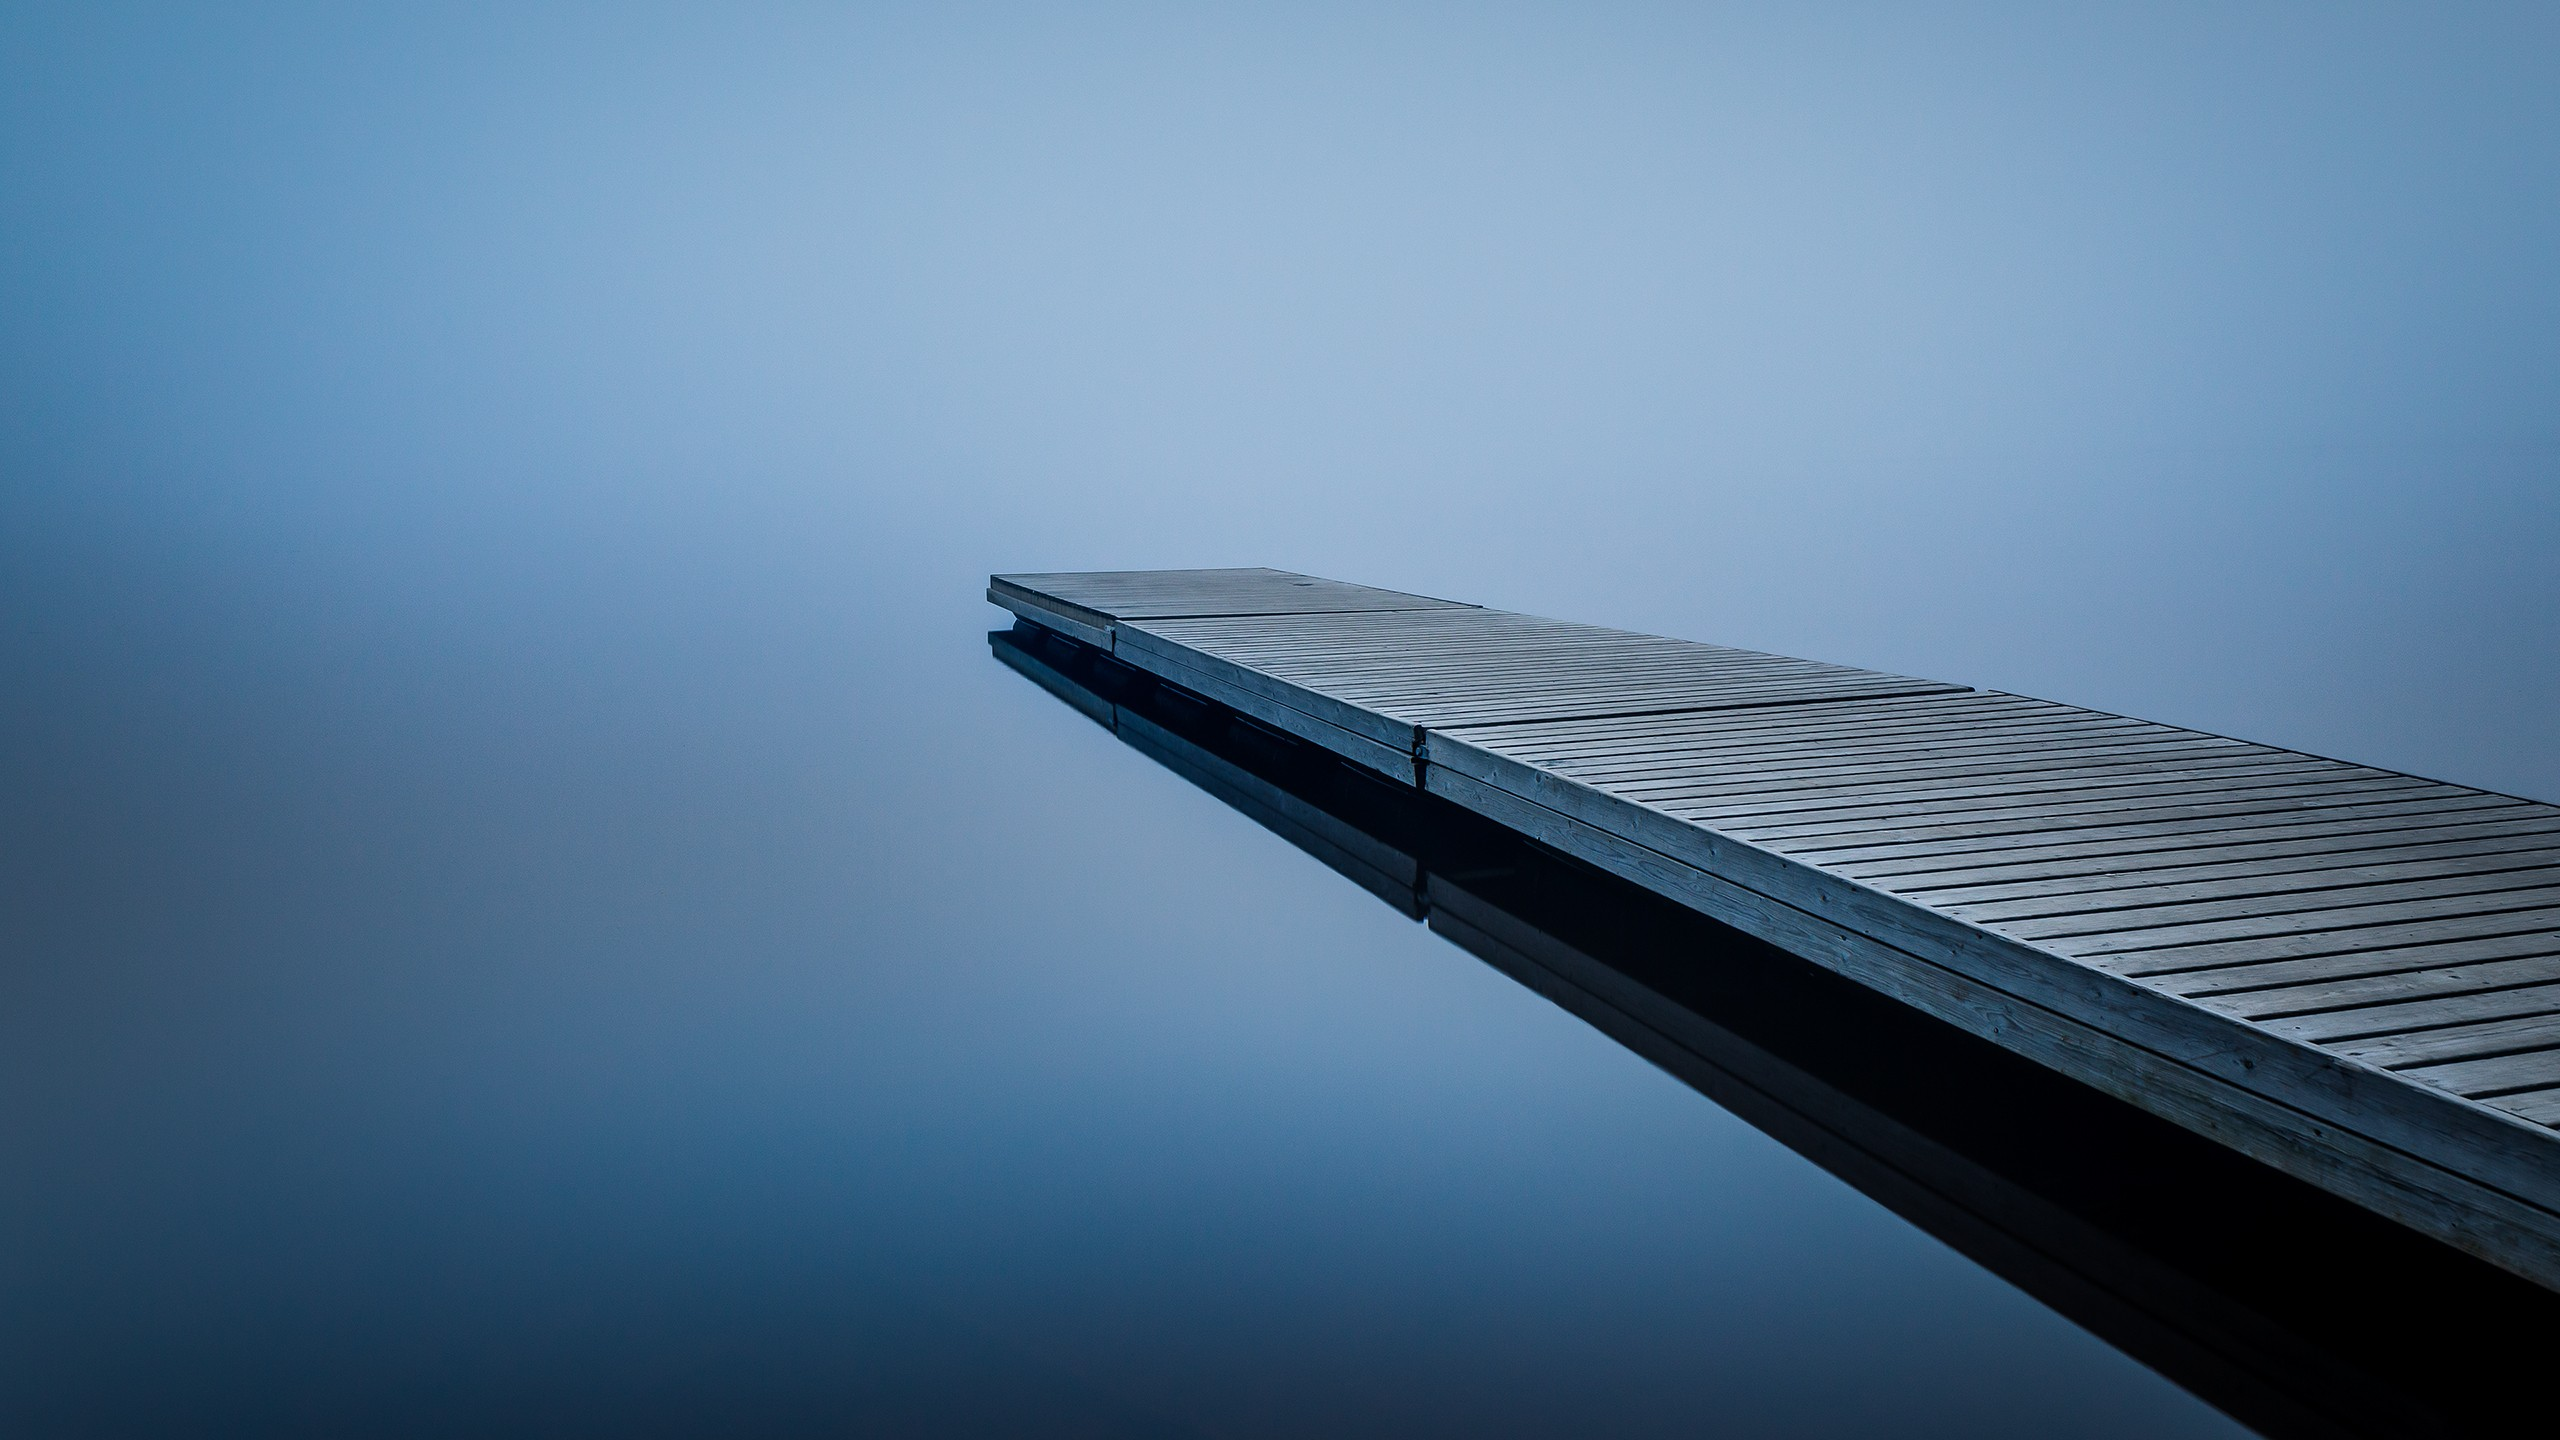 Cute Anime Wallpaper Hd Free Download Minimalism Calm Waters Finland Mist Water Bridge